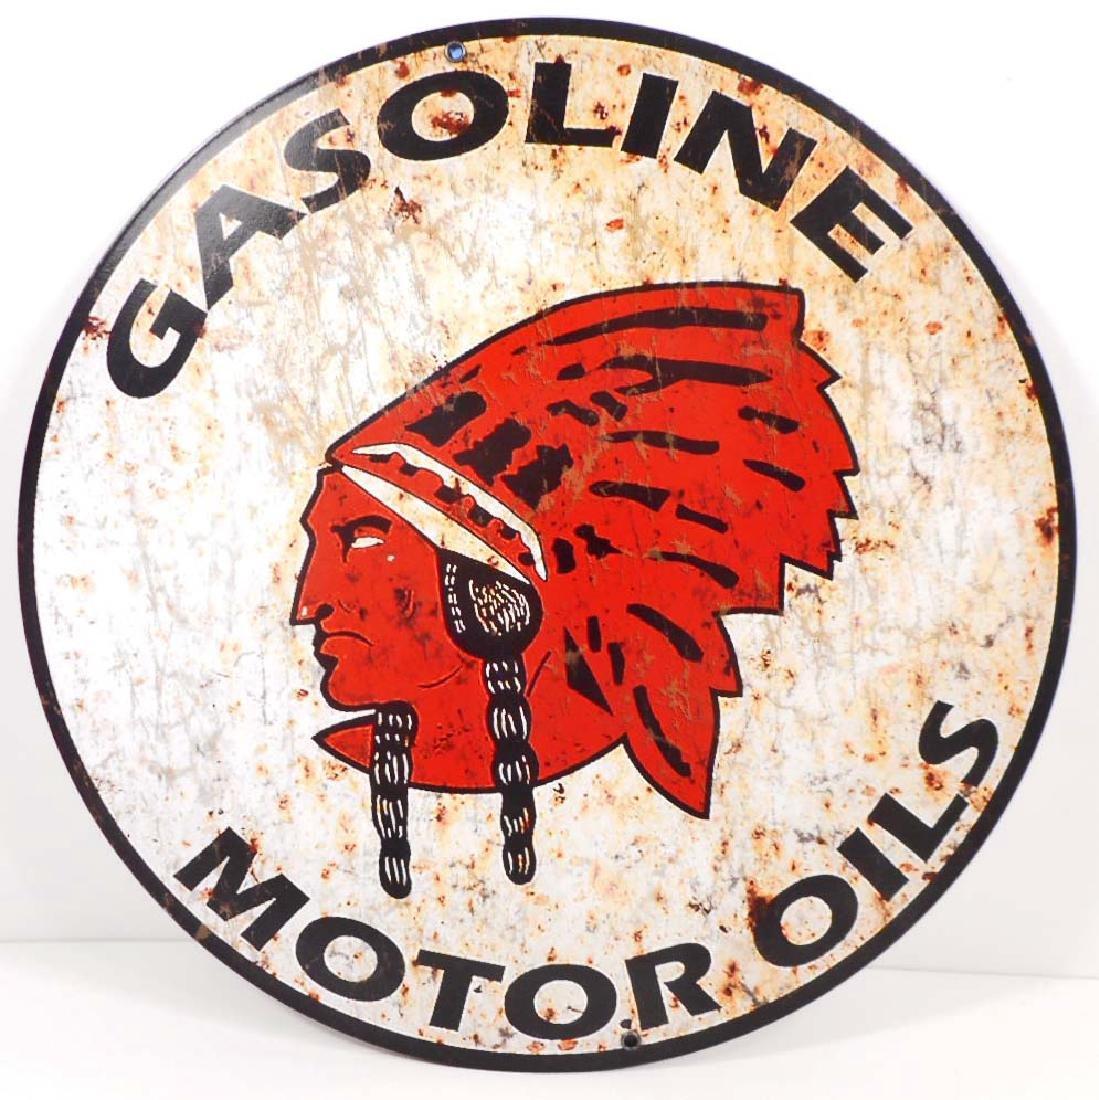 "GASOLINE MOTOR OIL METAL SIGN - 14"" ROUND"